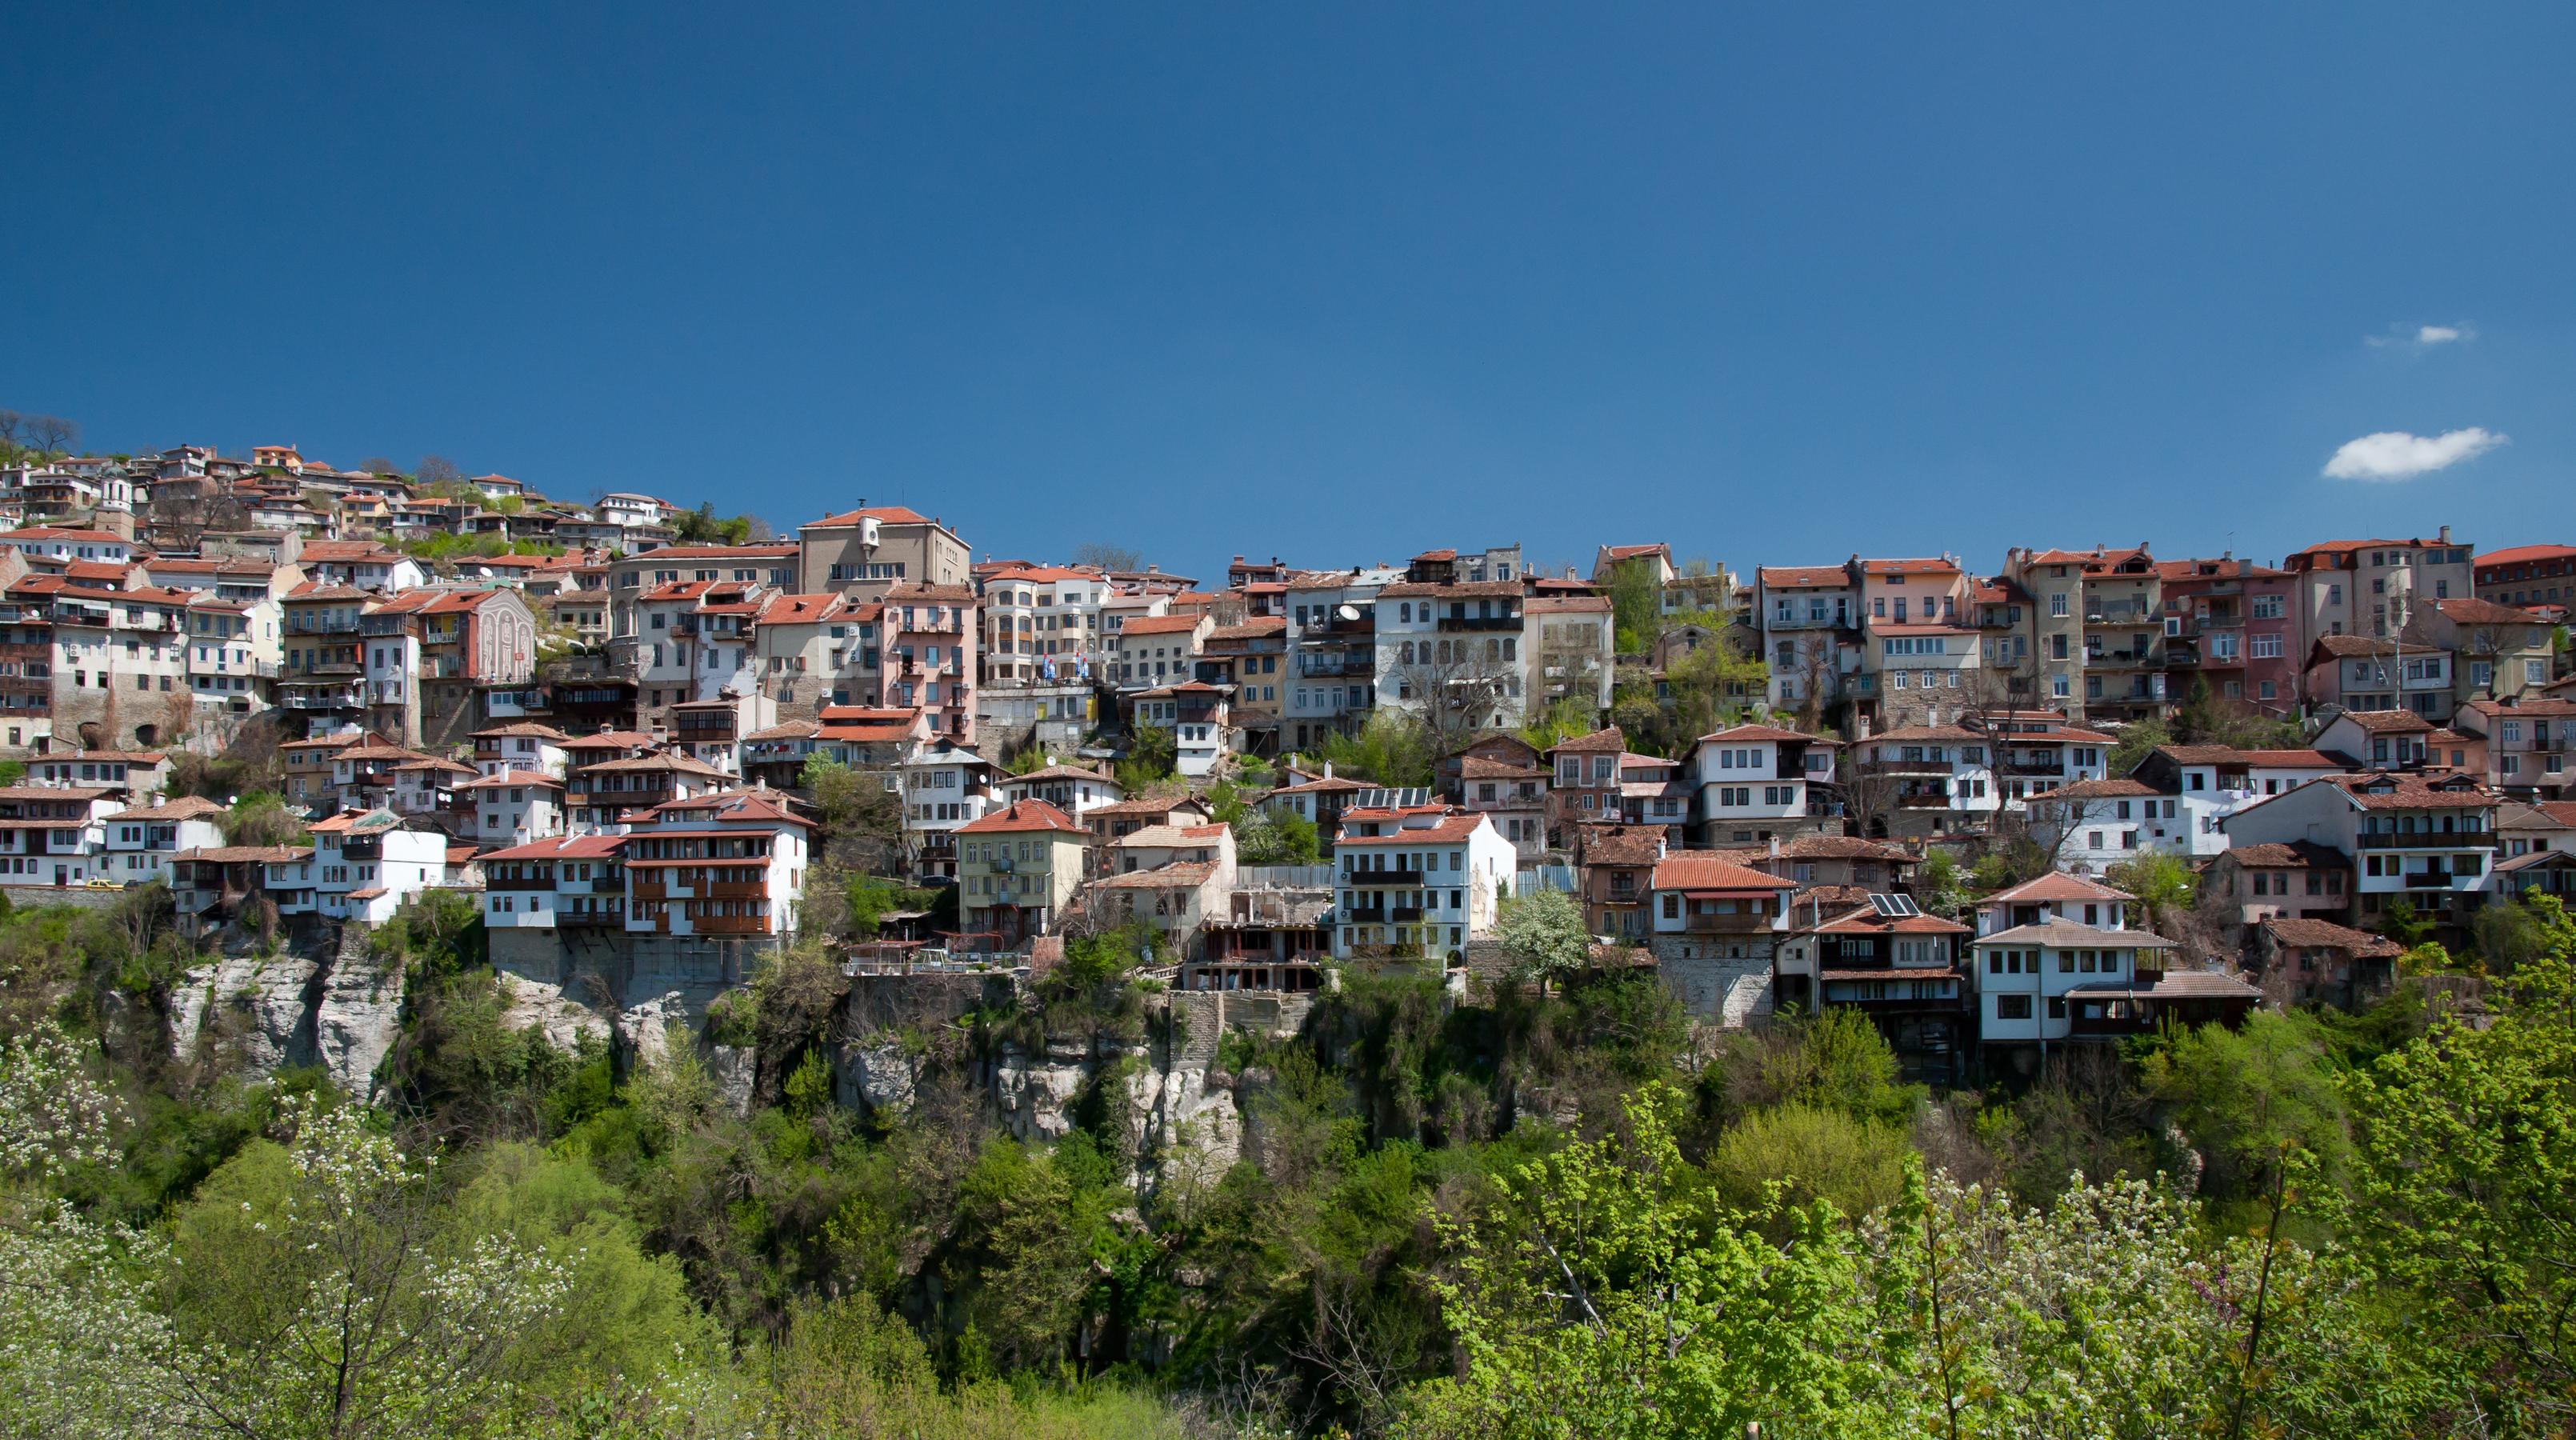 Am fost in excursie in Veliko Tarnavo. Ce mi-a placut si ce nu?